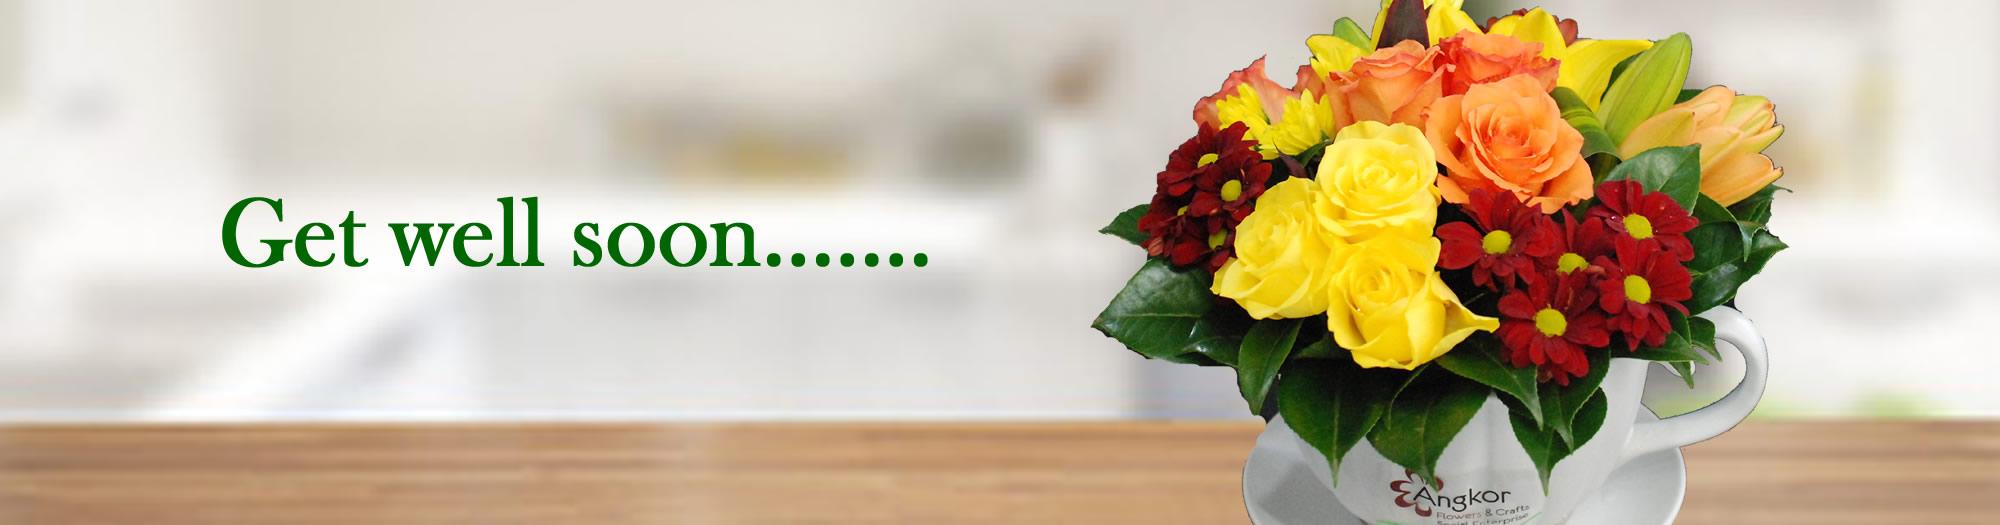 Angkor flowers- get well soon2